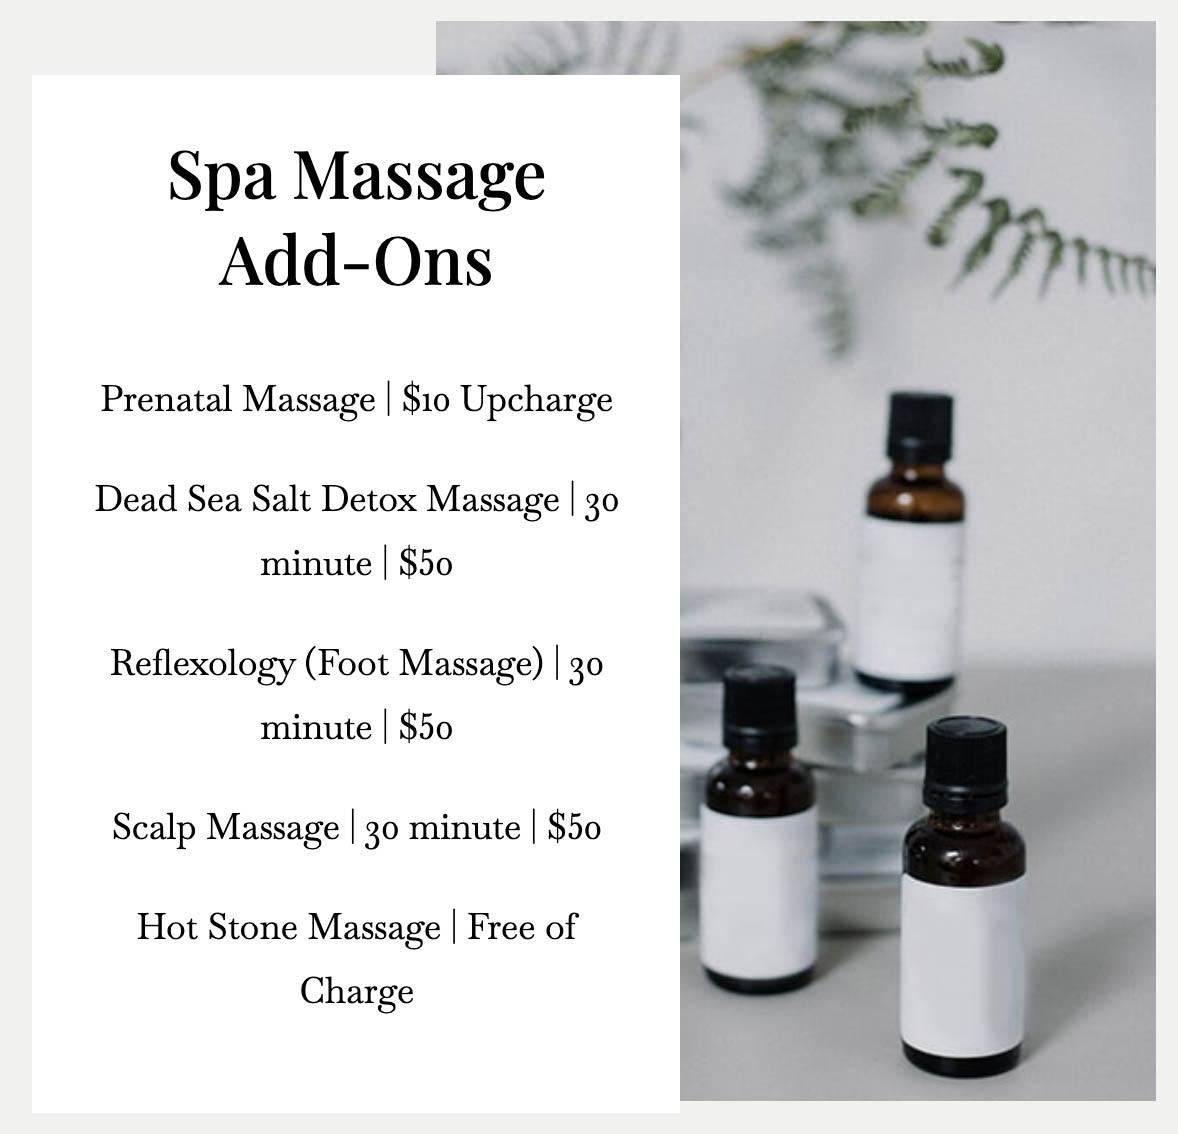 Massage price addon 2 in Vaughan